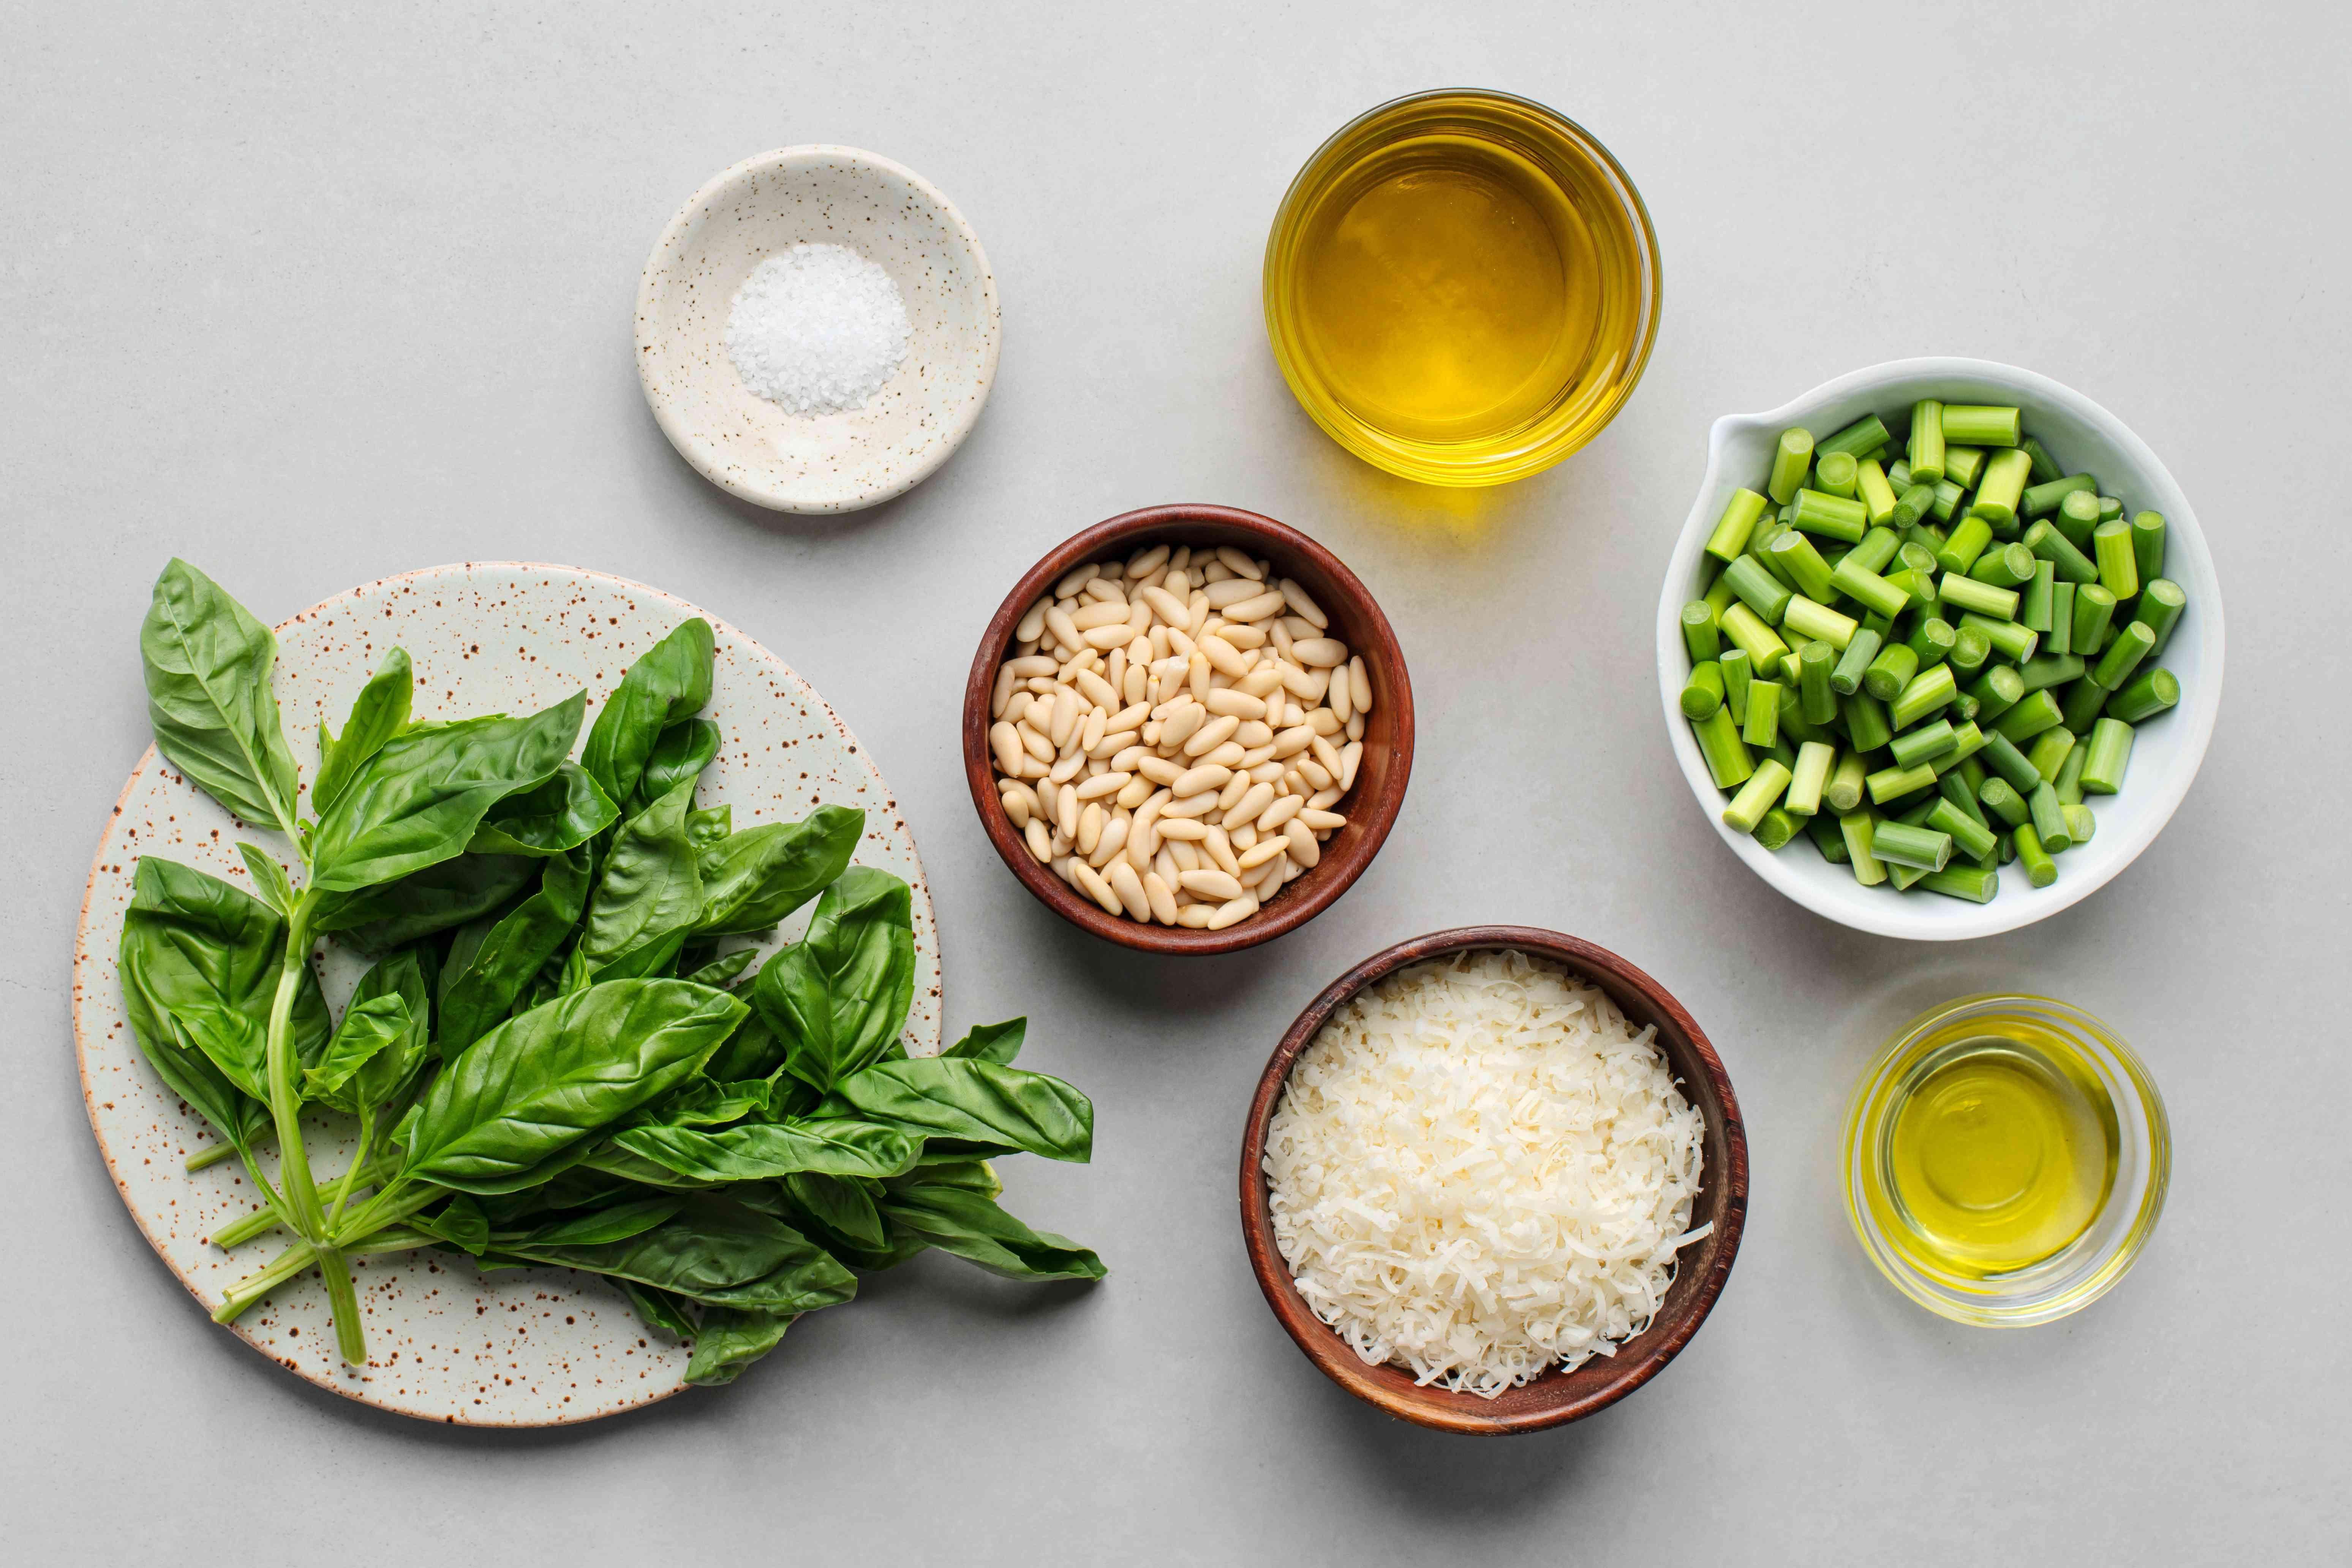 Garlic scape and basil pesto ingredients